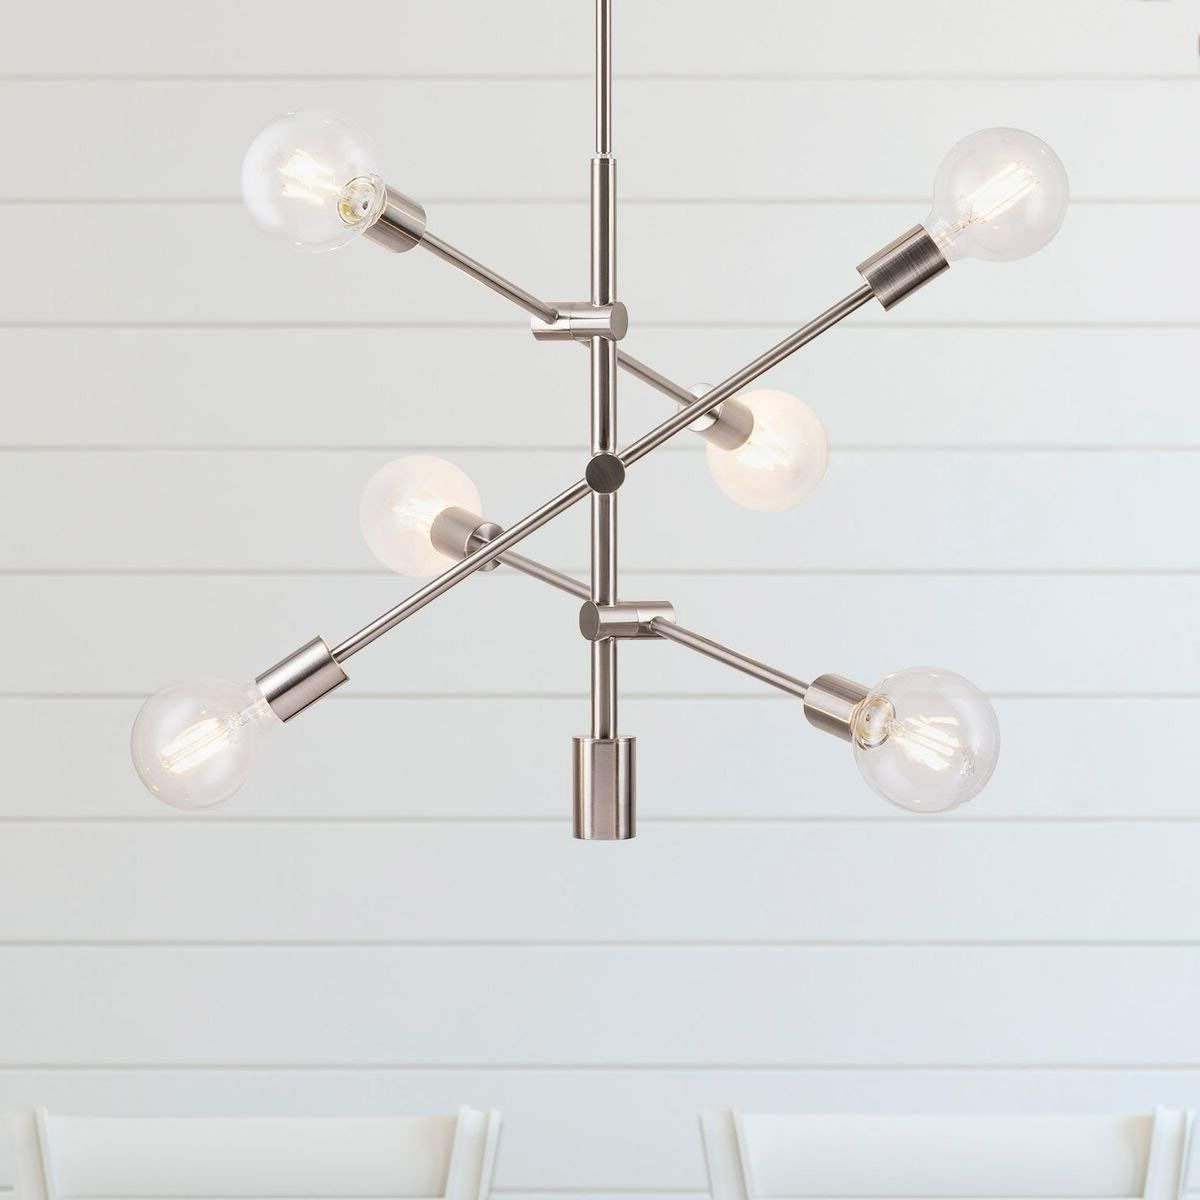 Eladia 6-Light Sputnik Chandeliers with Famous Marabella Led Sputnik Chandelier Light Fixture, Brushed